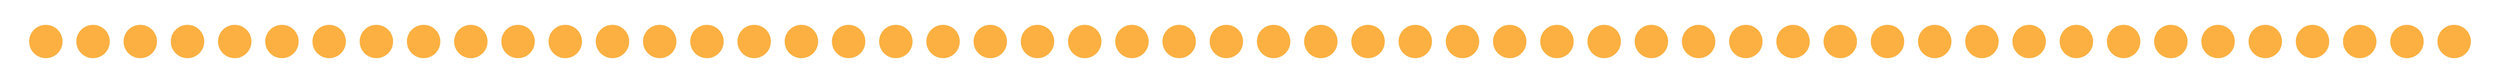 white dots longest.jpg